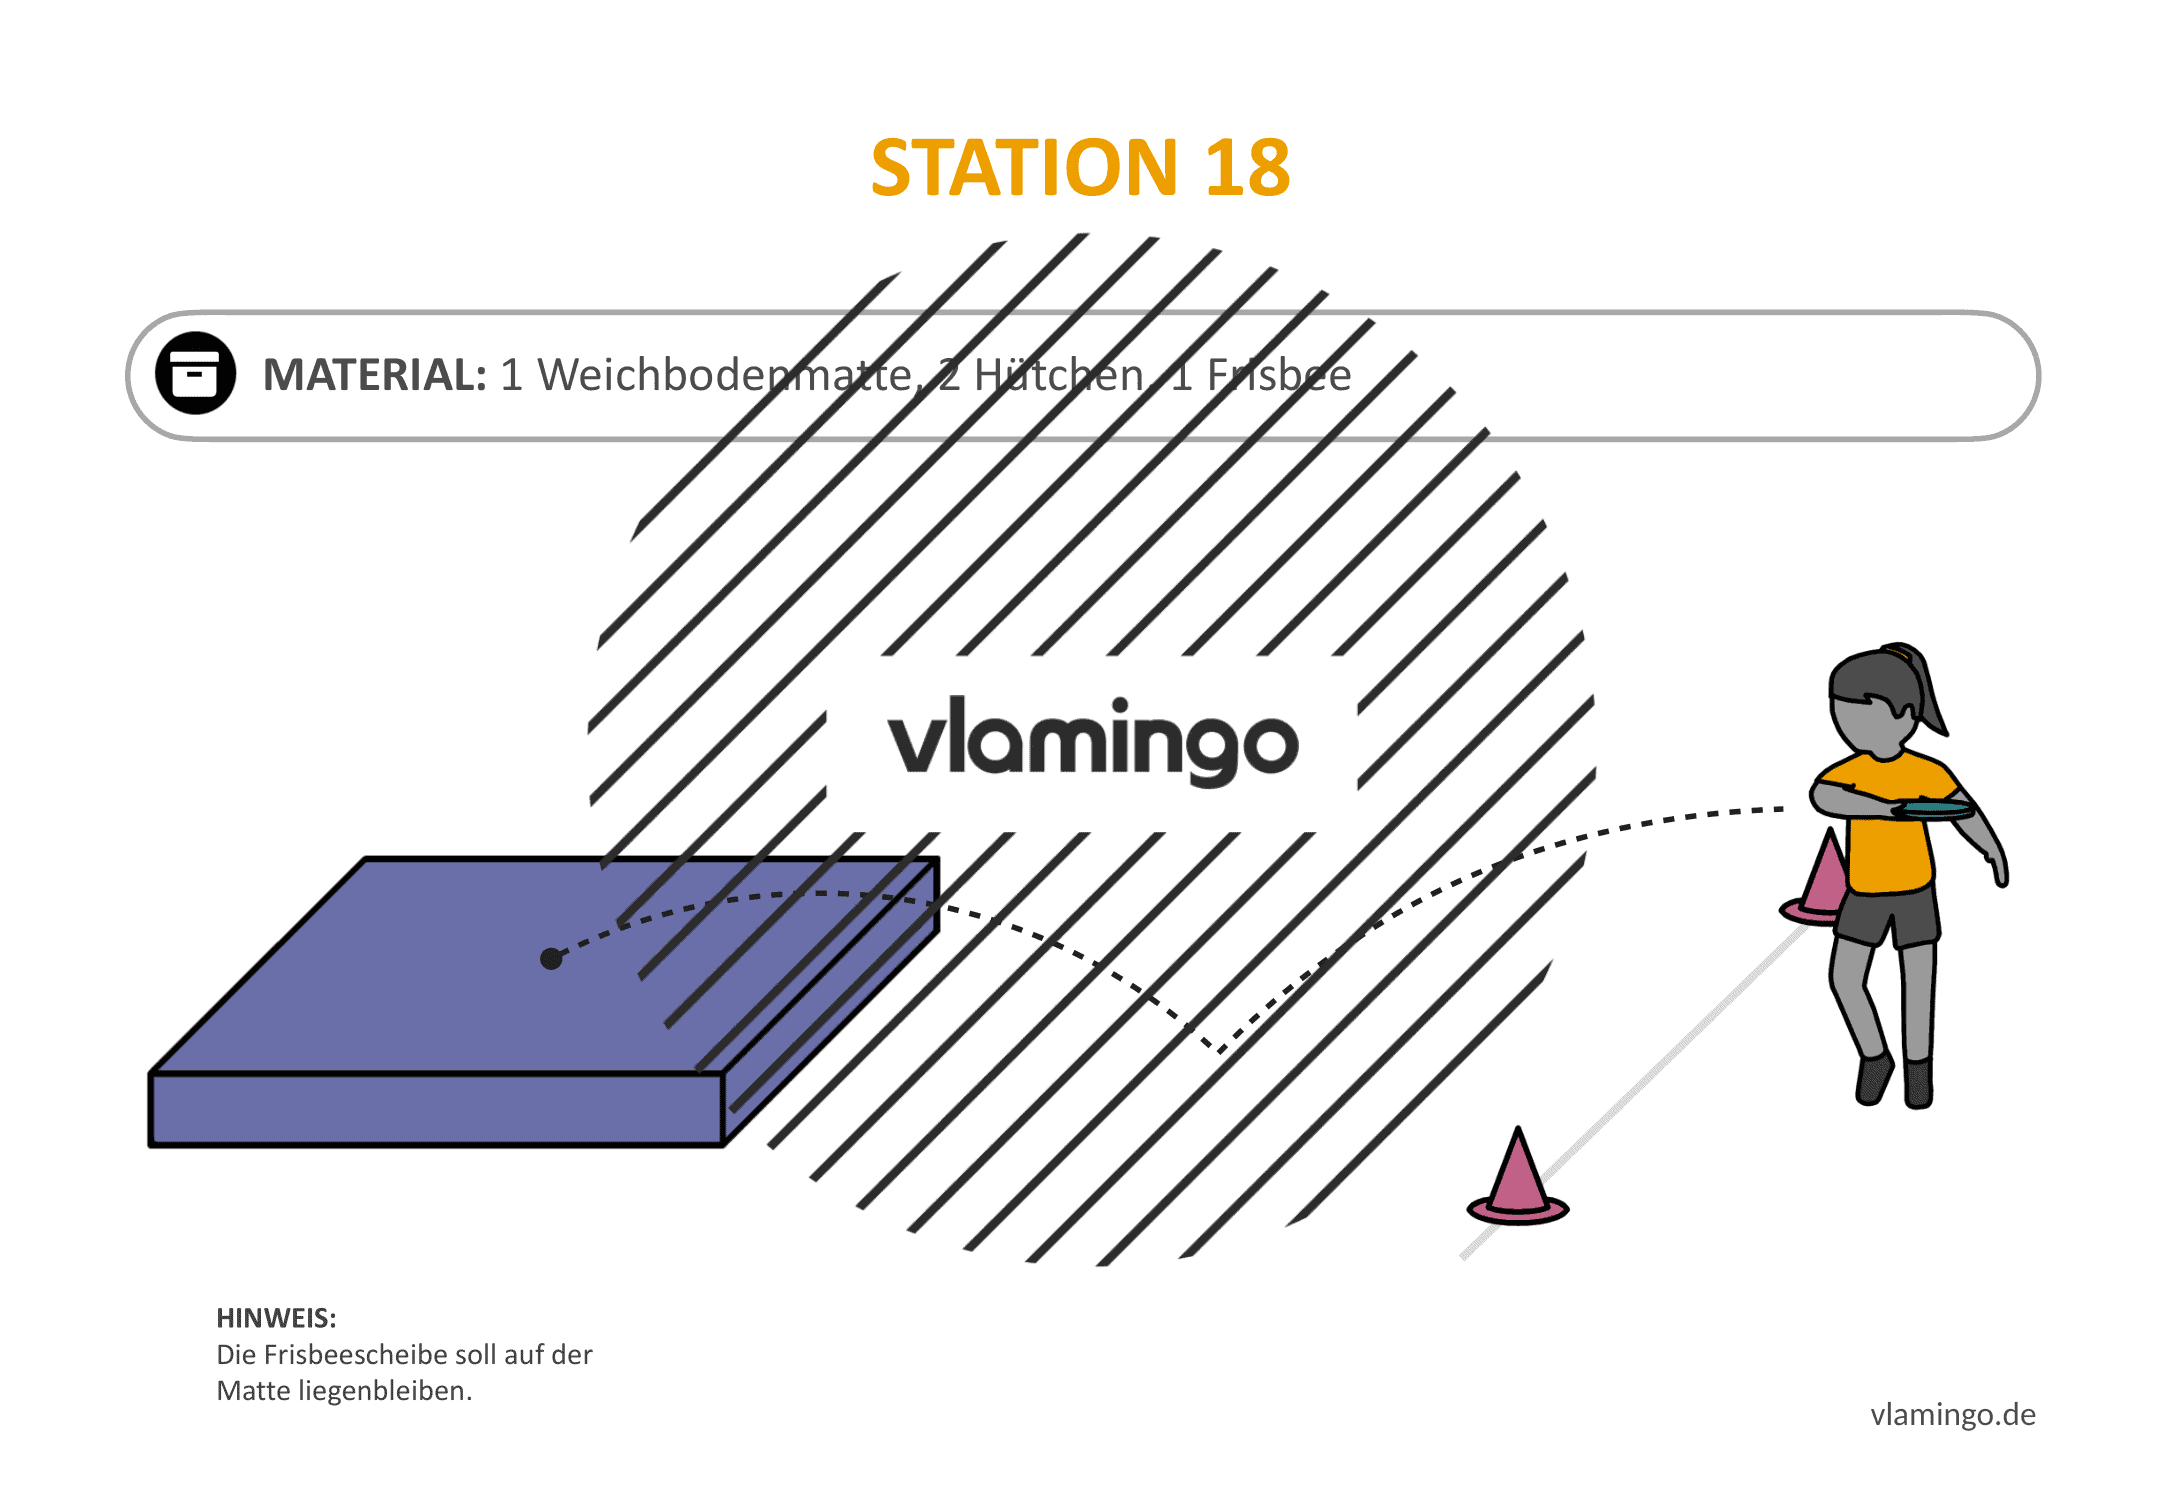 Frisbeegolf (Disc-Golf) - Station 18